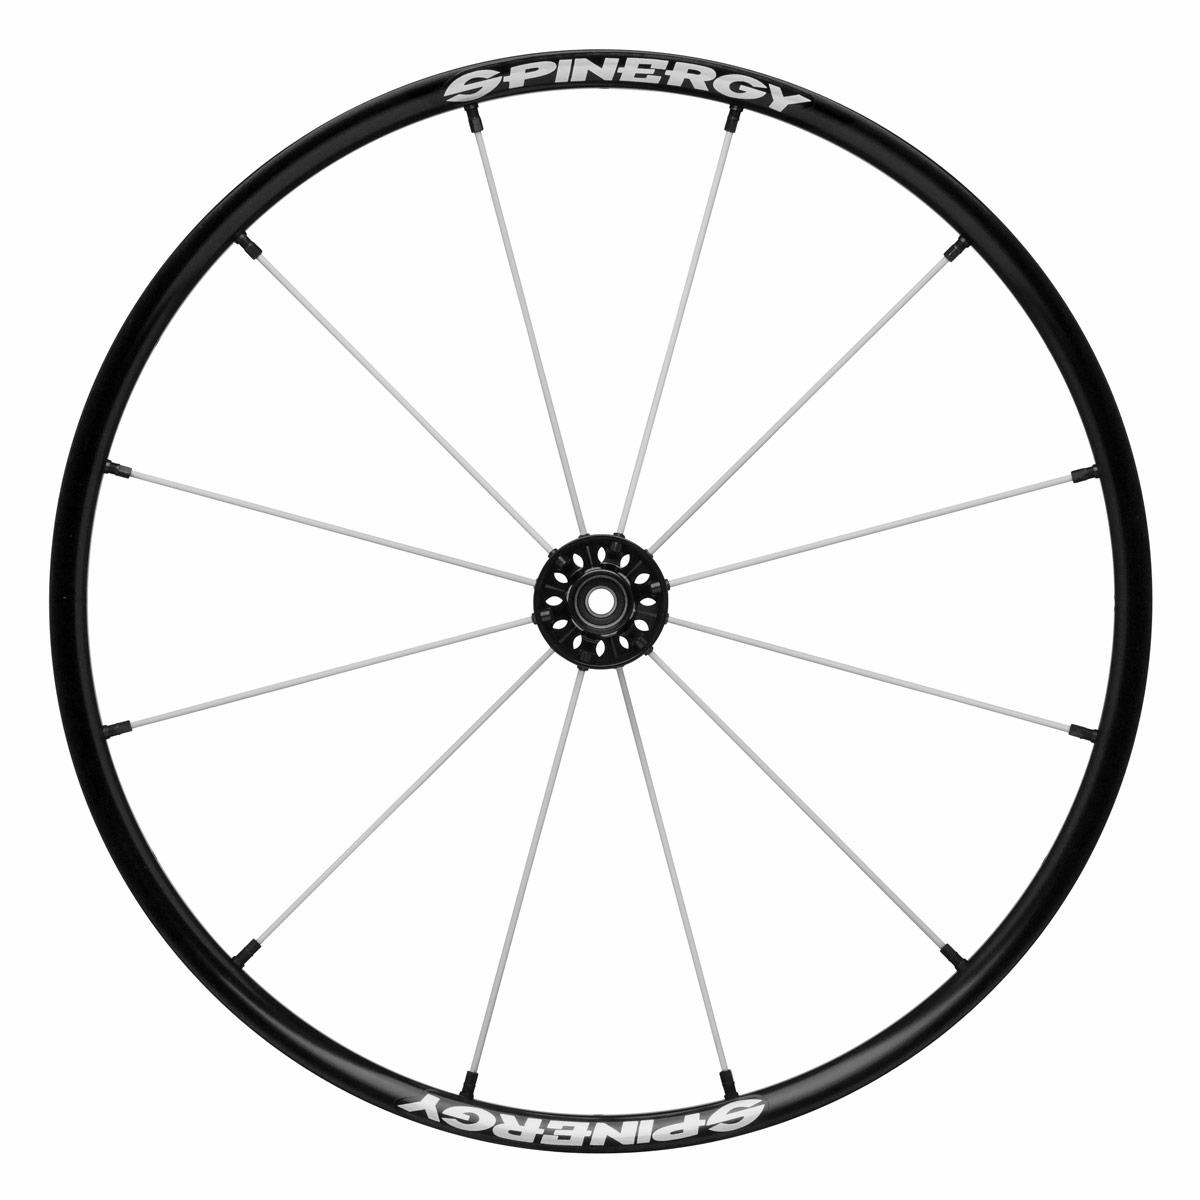 Spinergy Lite Extreme Lx Wheelchair Wheels